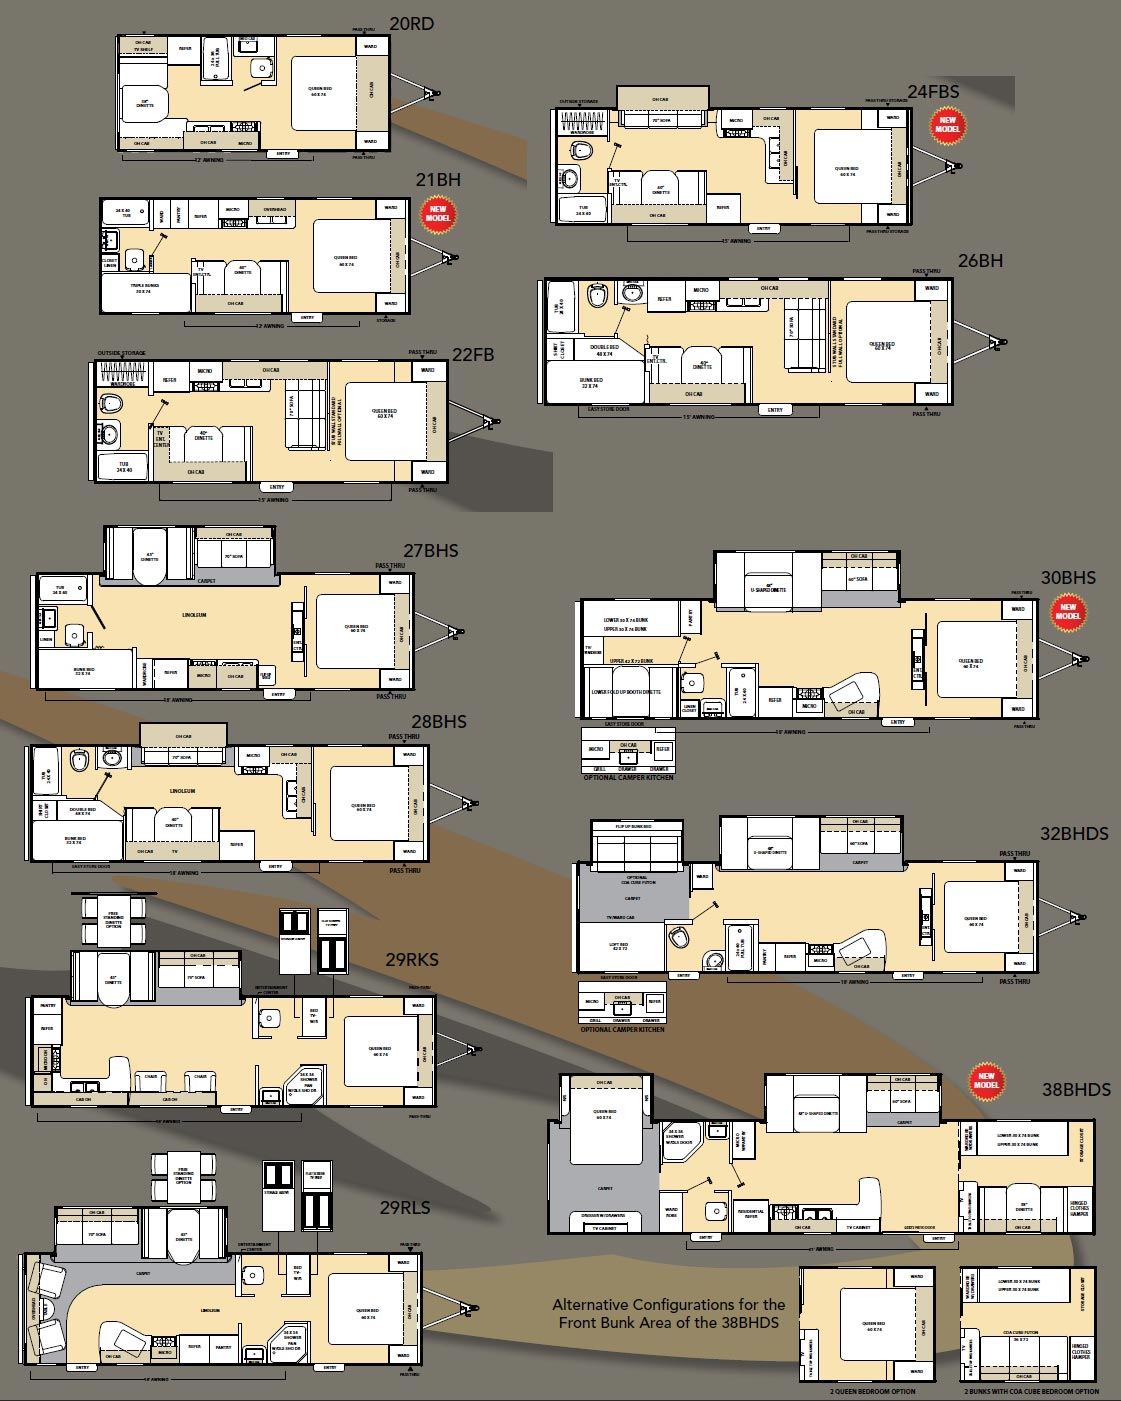 Coachmen Catalina Lite Wiring Diagram Bookmark About Travel Trailer Plumbing Trailers Diagrams Schematic Rh 89 Slf Urban De Motorhome 2017